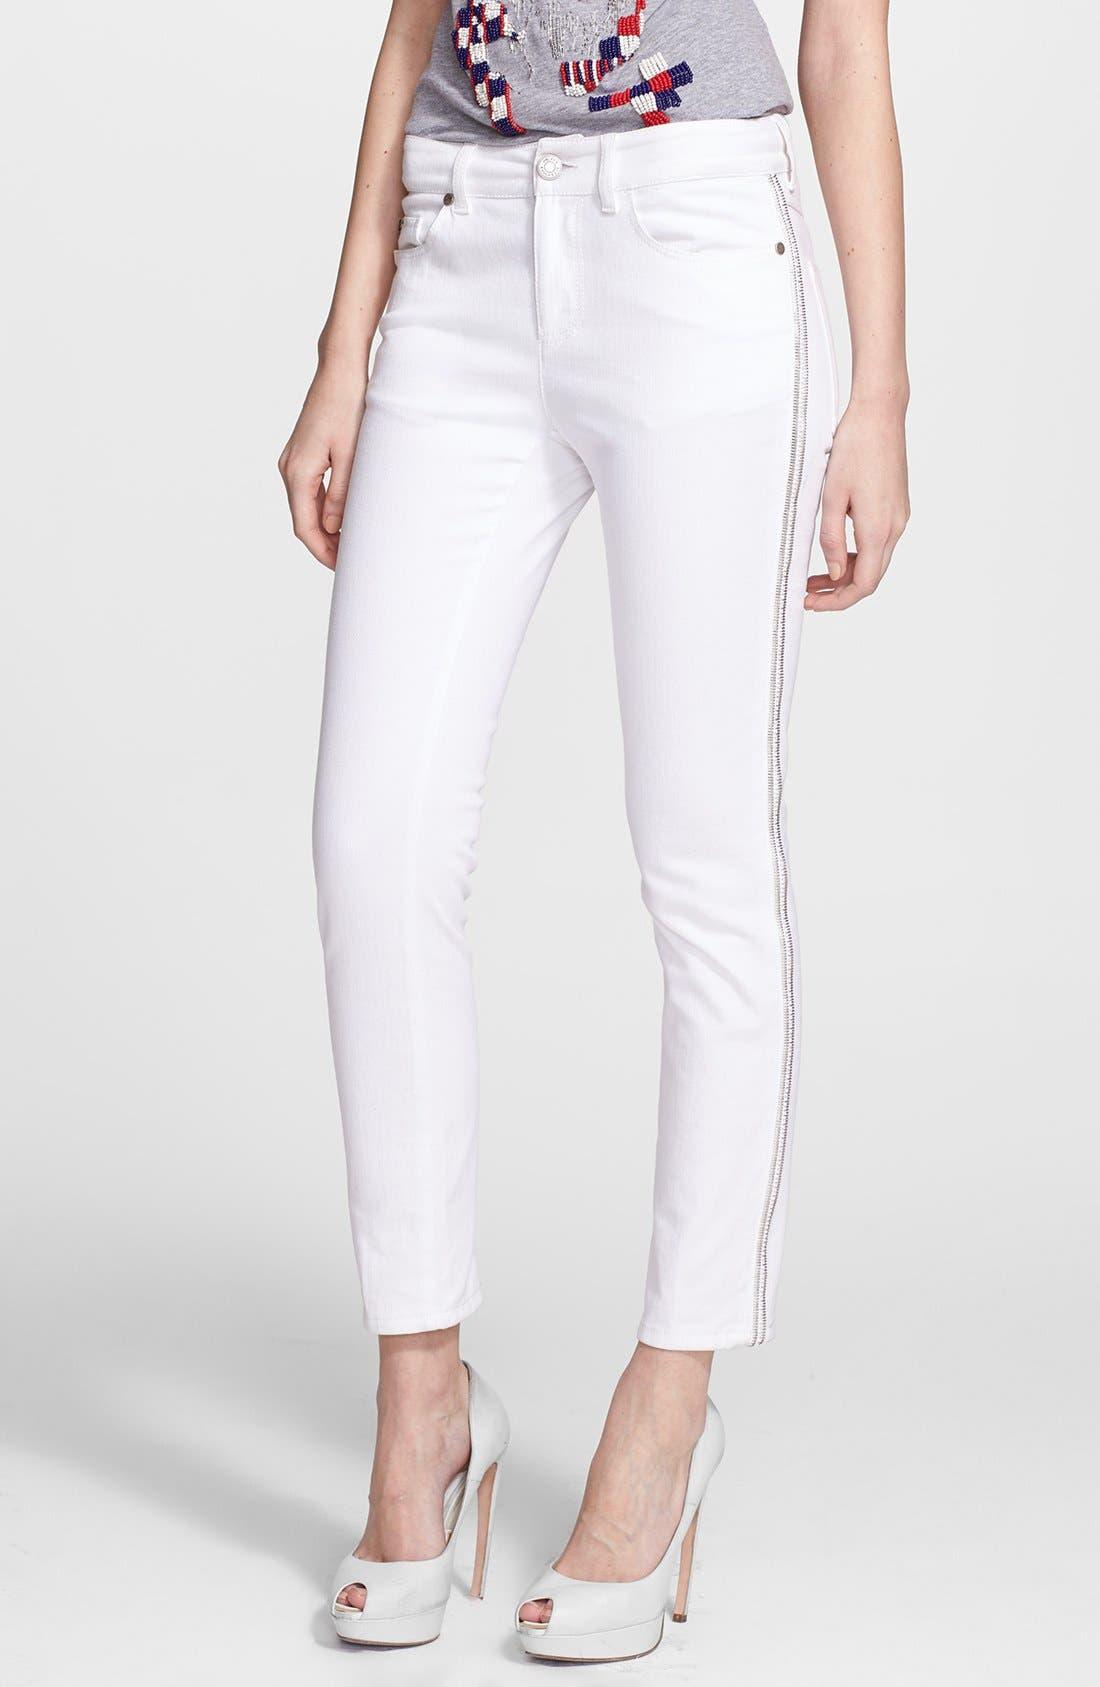 Alternate Image 1 Selected - Alexander McQueen Zip Detail Skinny Ankle Jeans